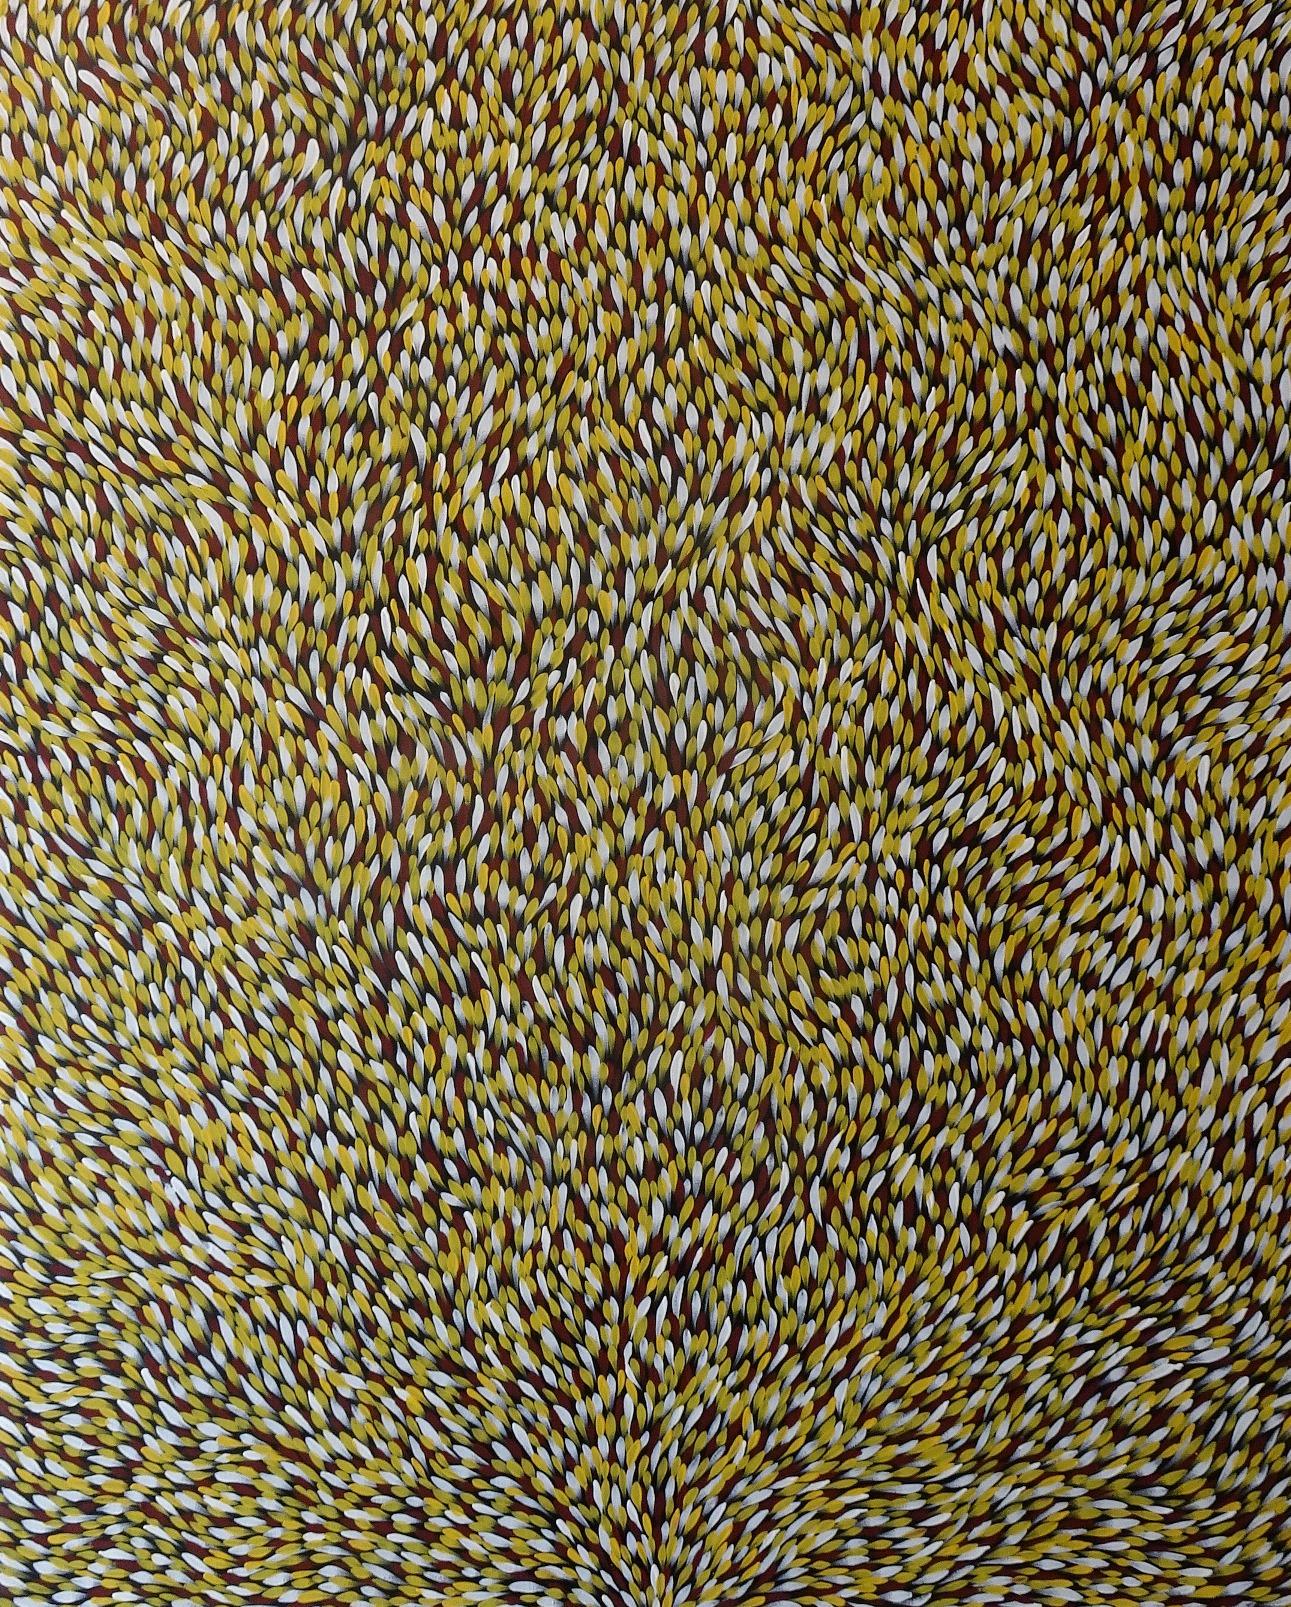 Gloria Petyarre Medicine Leaves 7c Artlandish Aboriginal Art